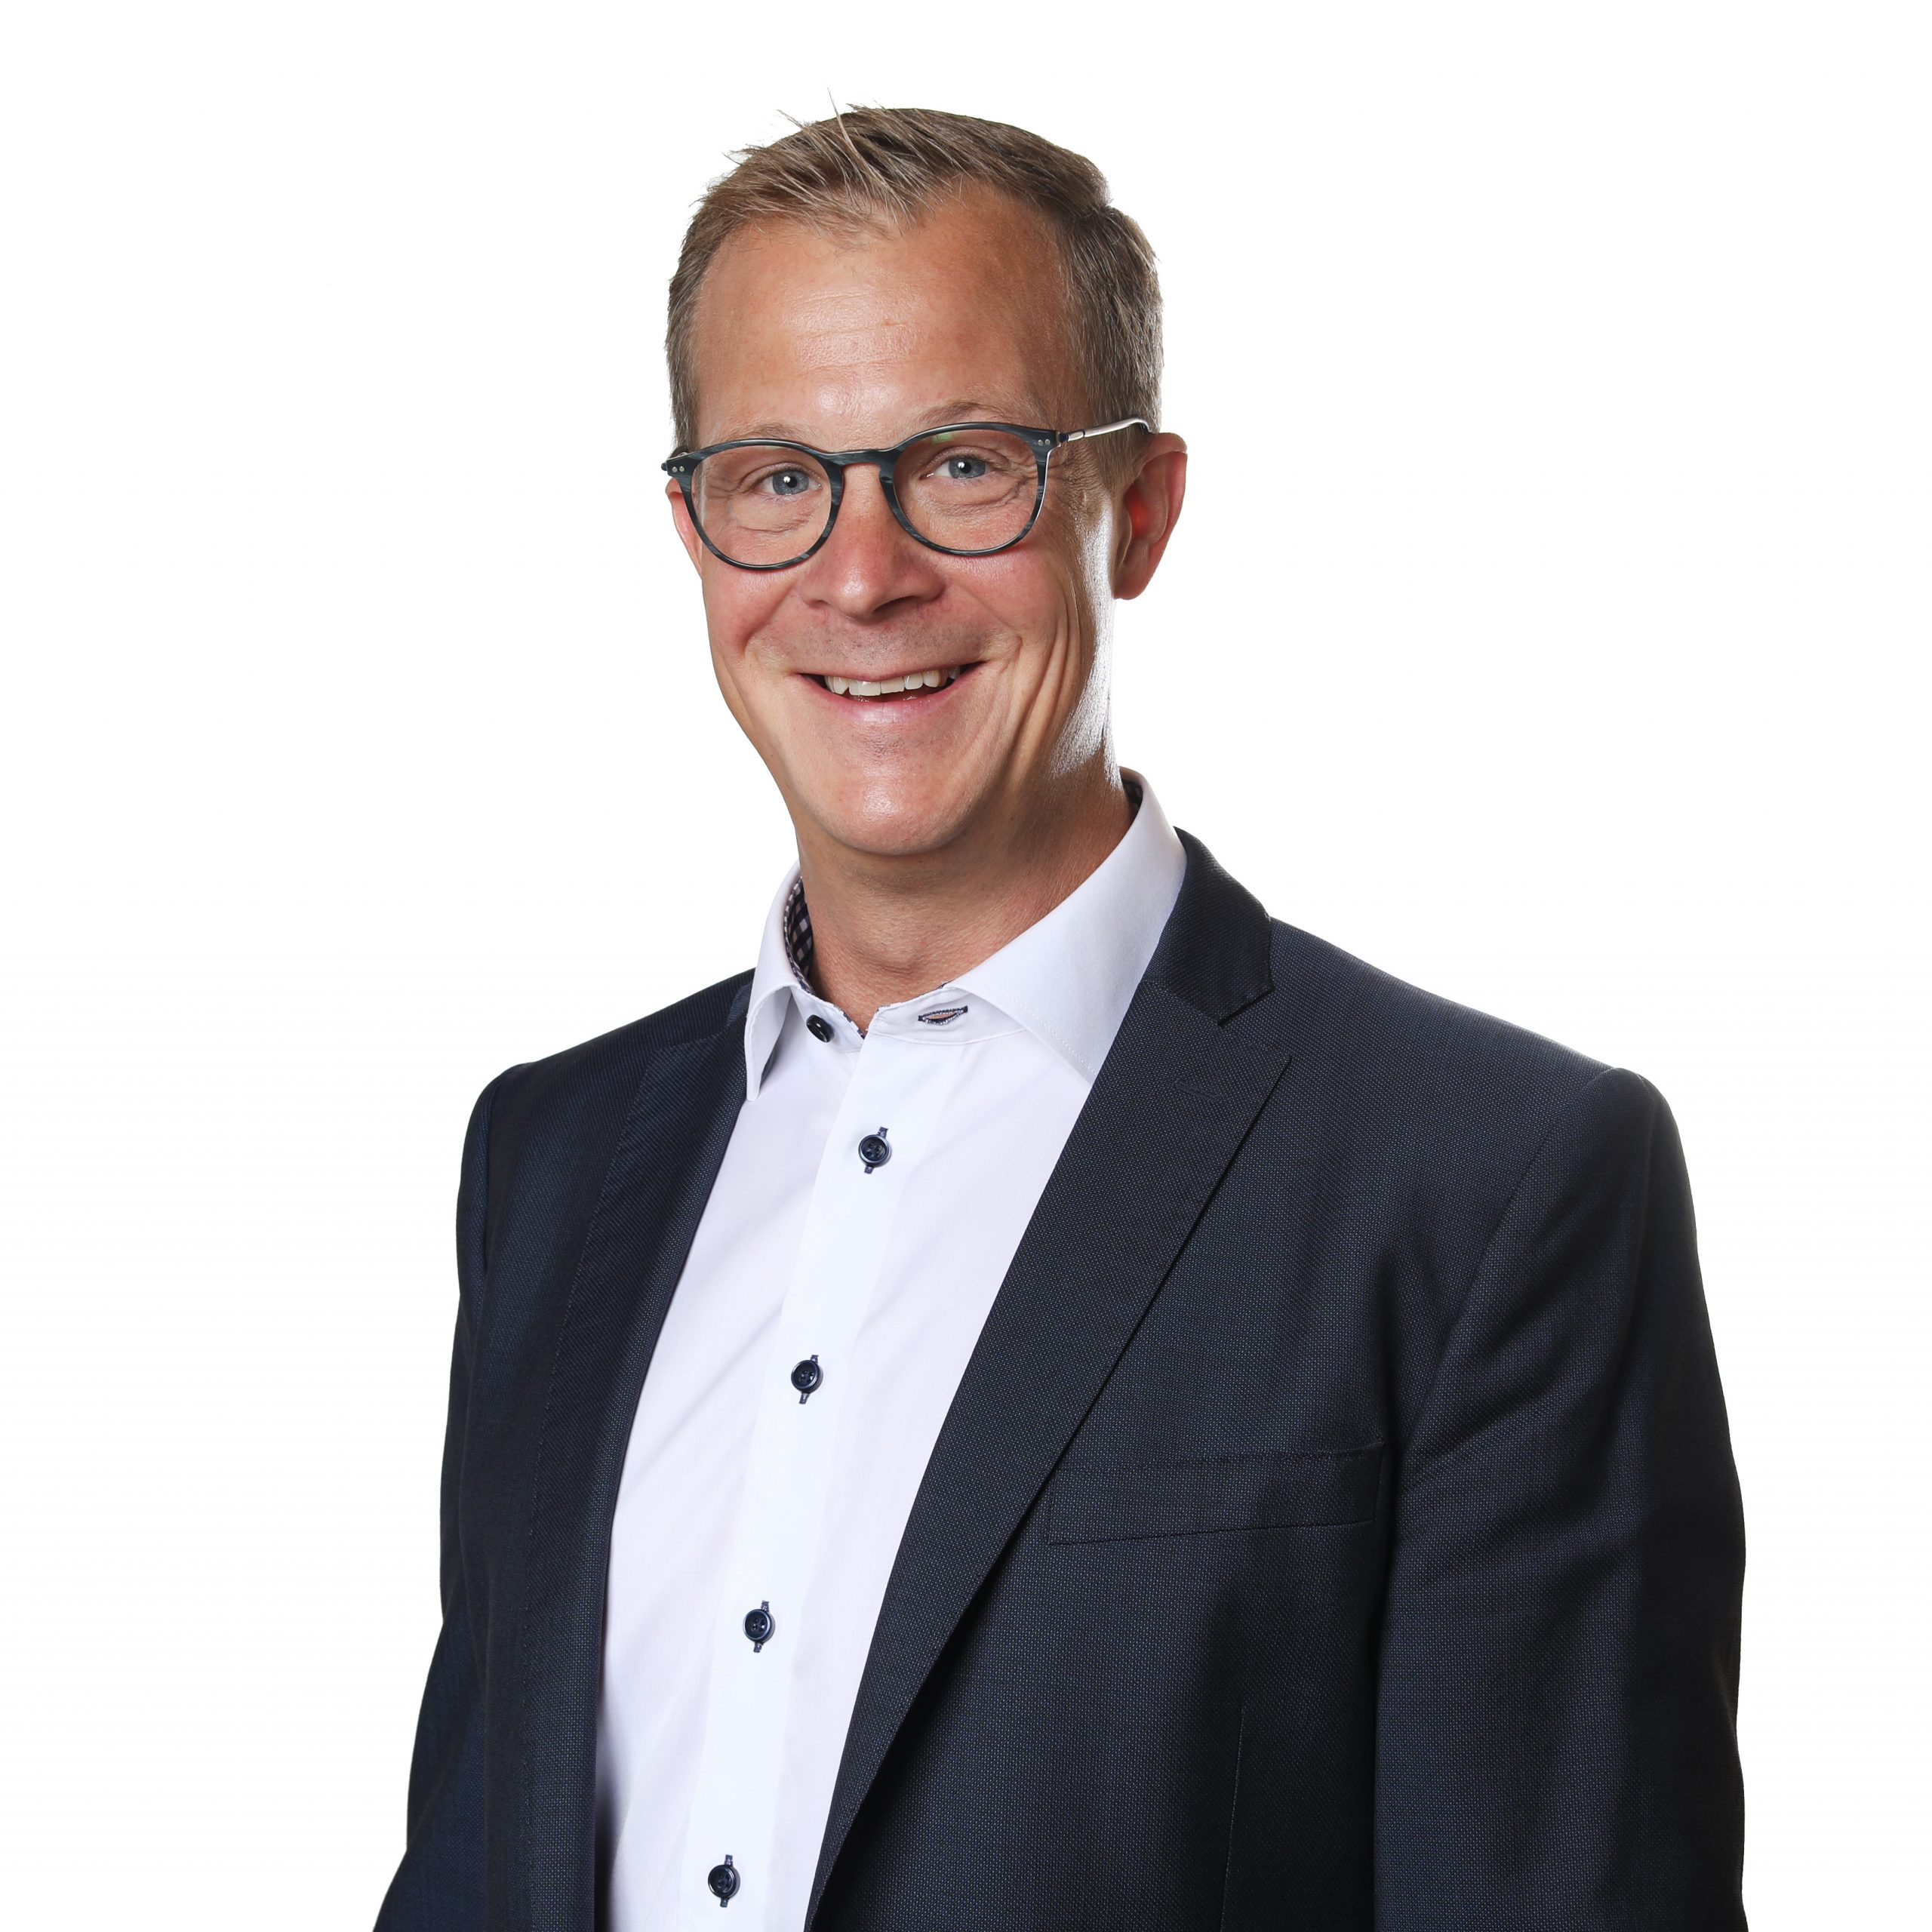 Niklas Ölmestrand